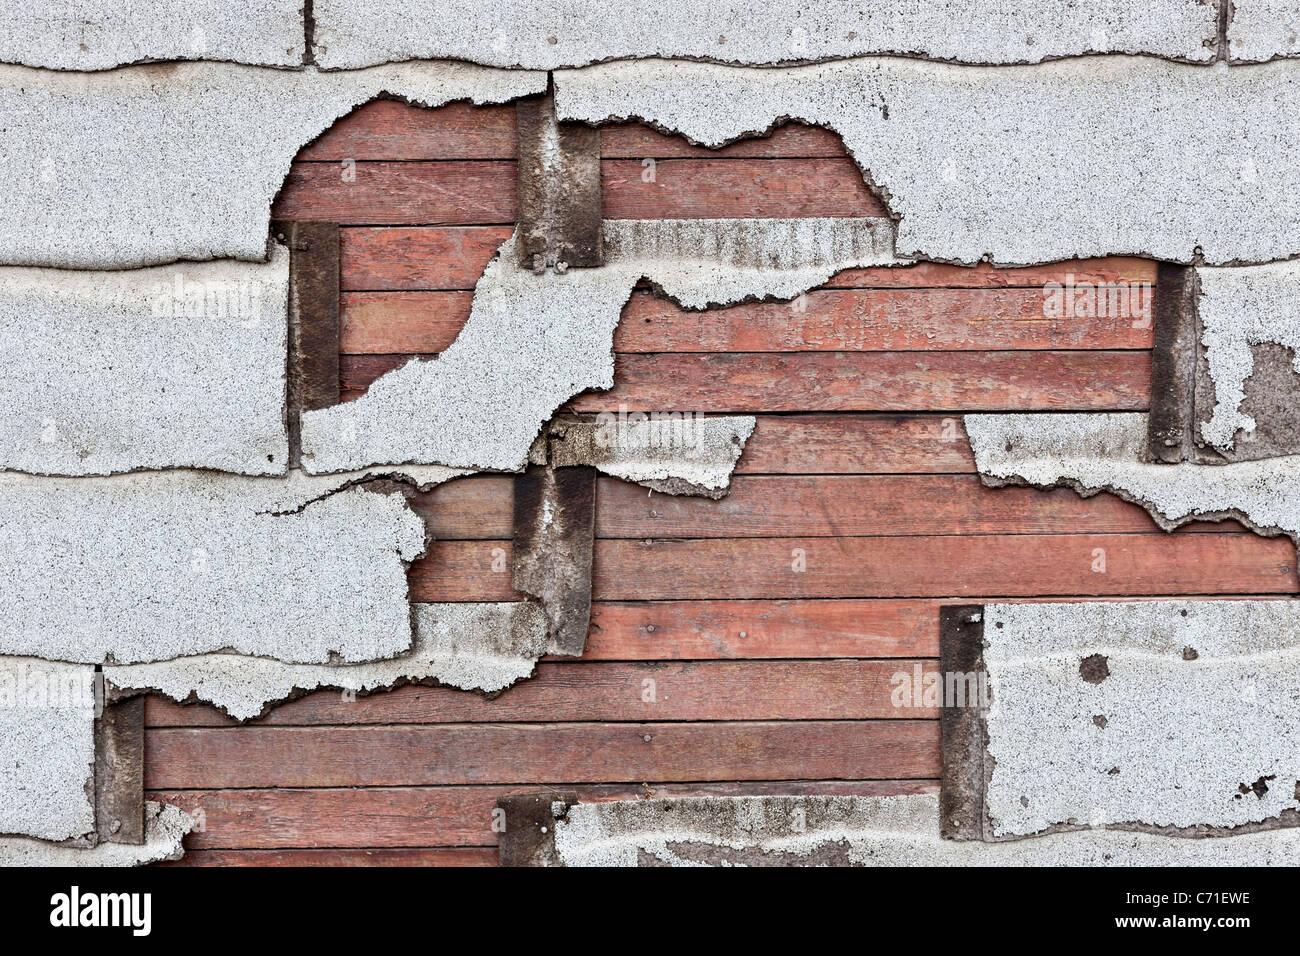 Asbestos composition asphalt shingles deteriorating - Stock Image